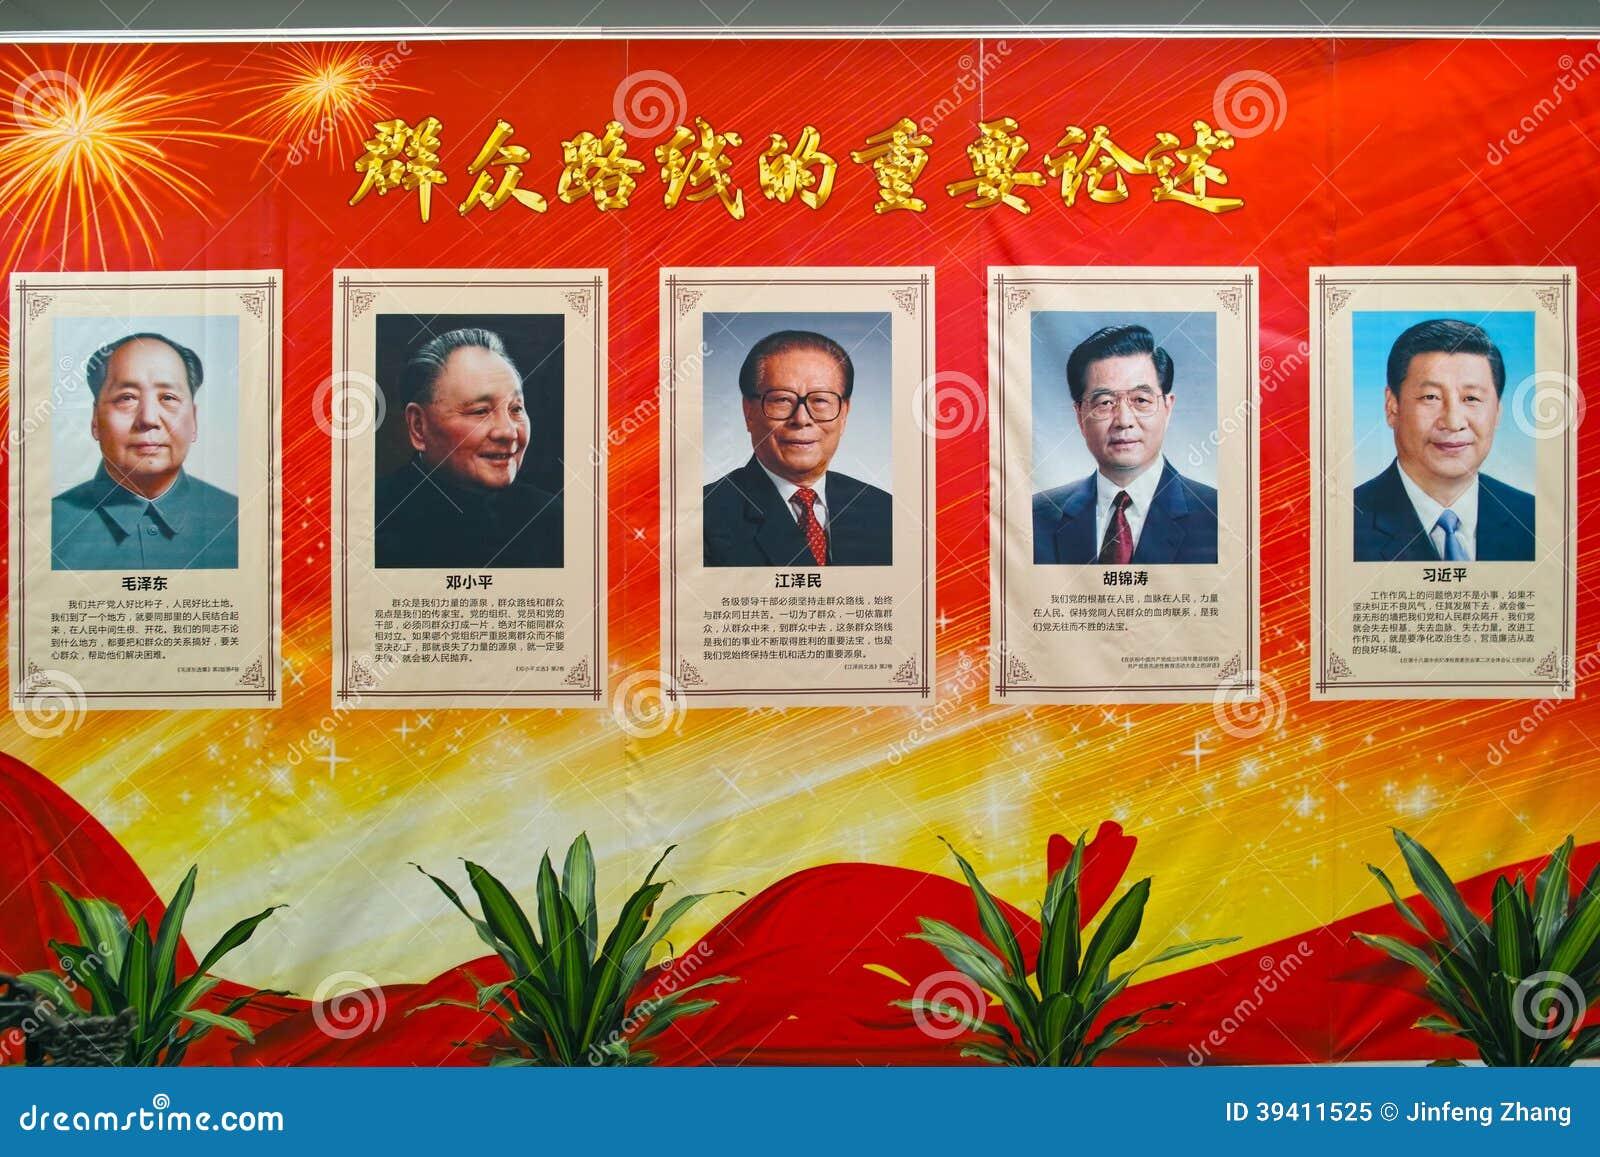 Portraits of China Communist leader